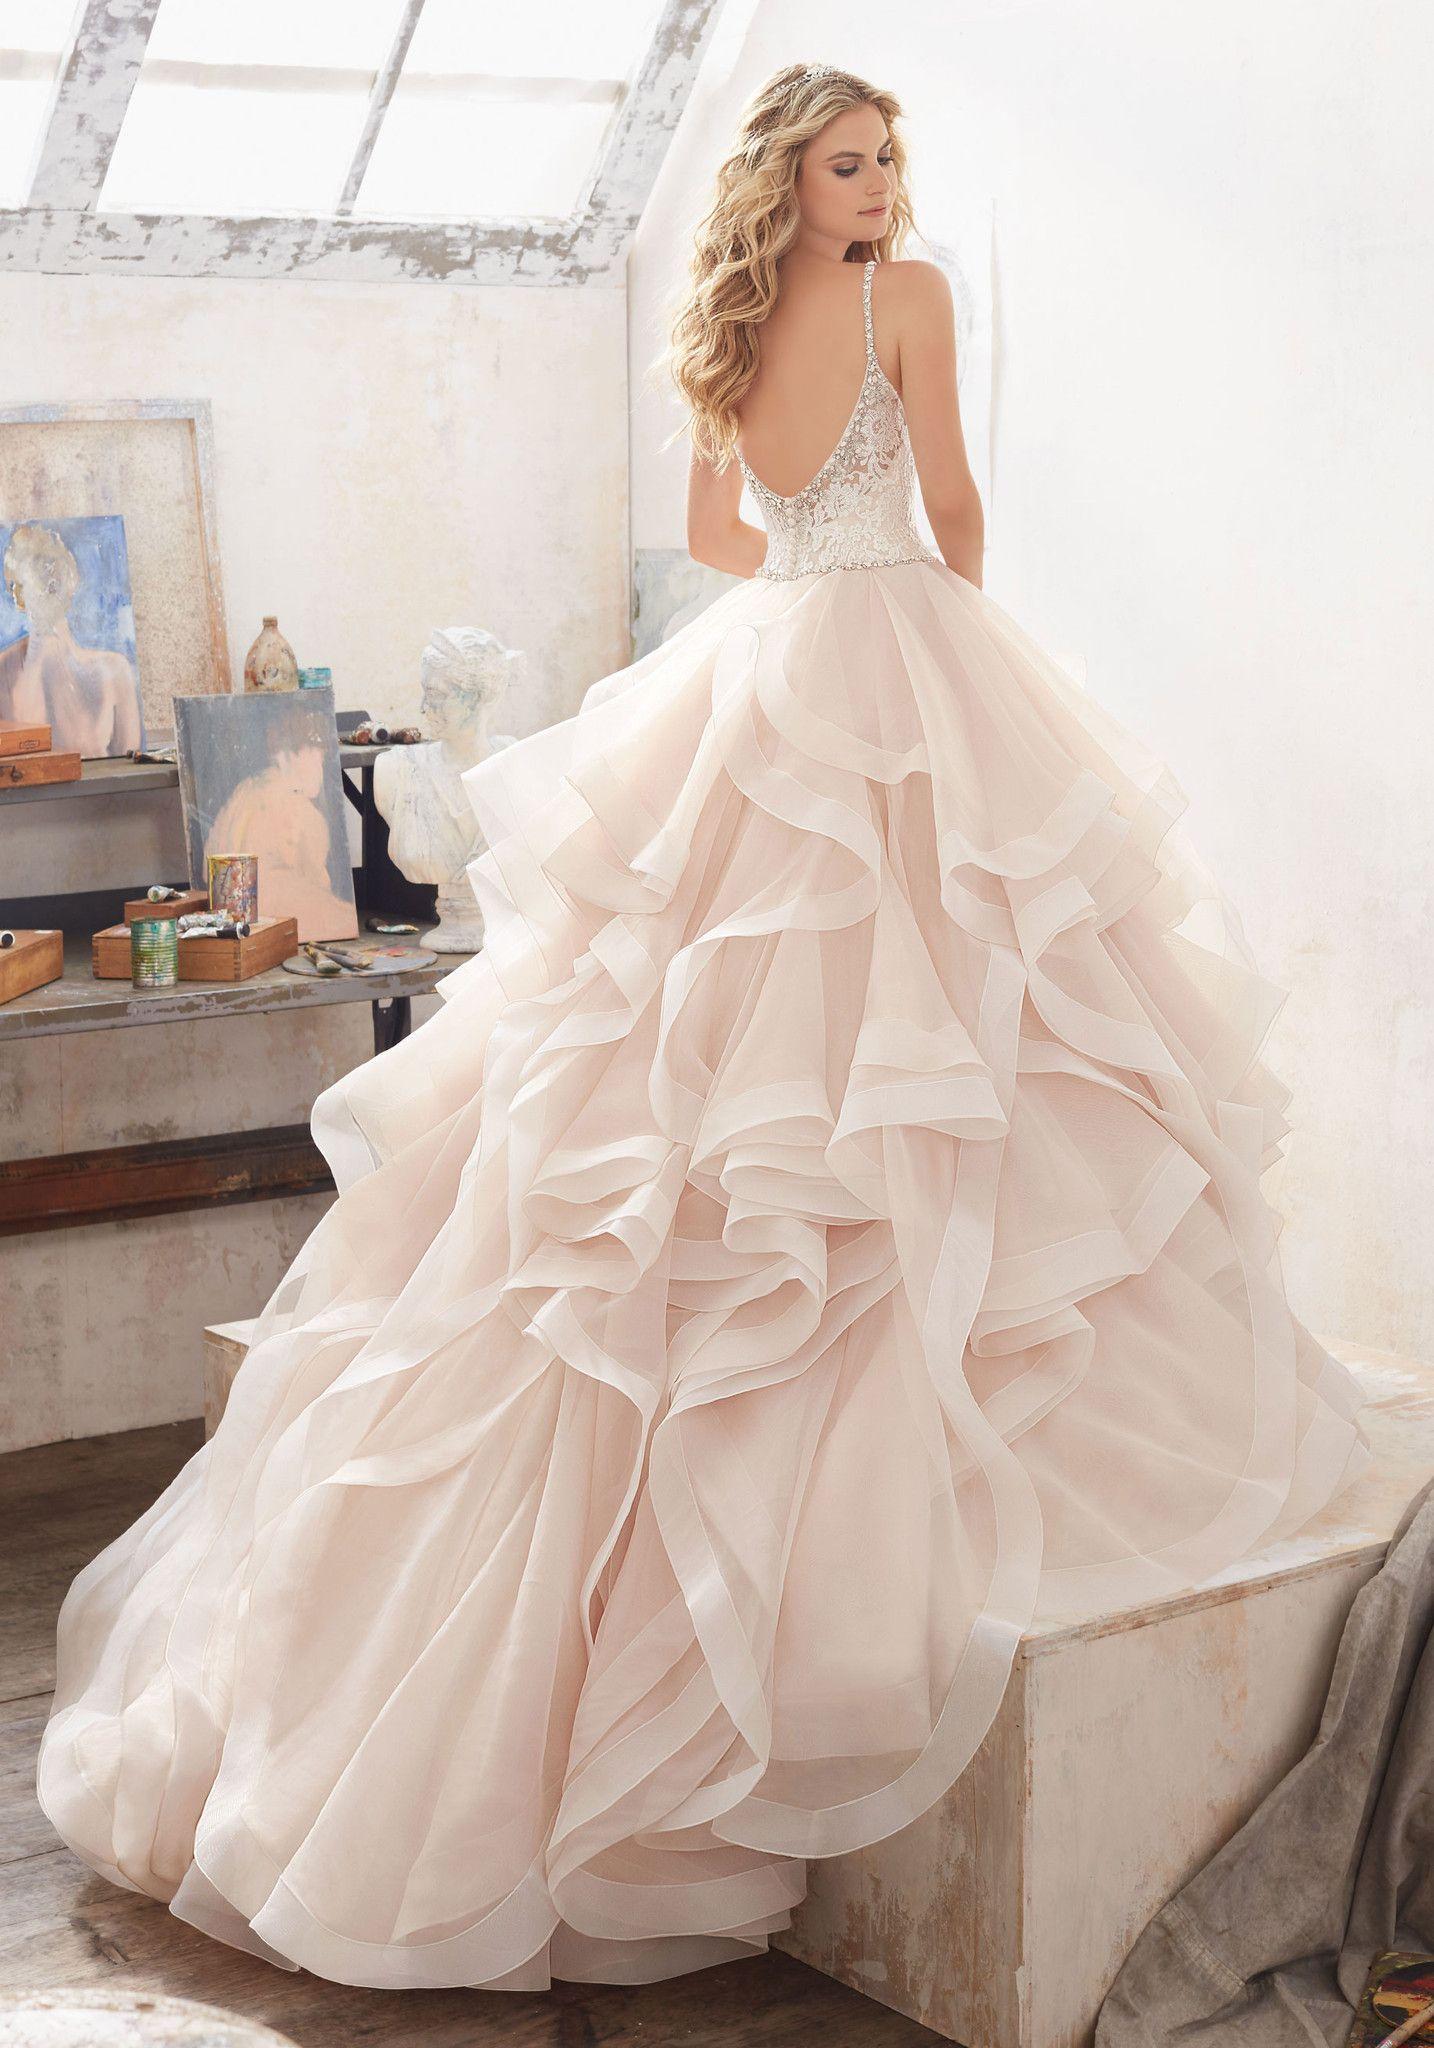 Mori lee gold wedding dress  Mori Lee  Marilyn    All Dressed Up Bridal Gown  Tuxedo